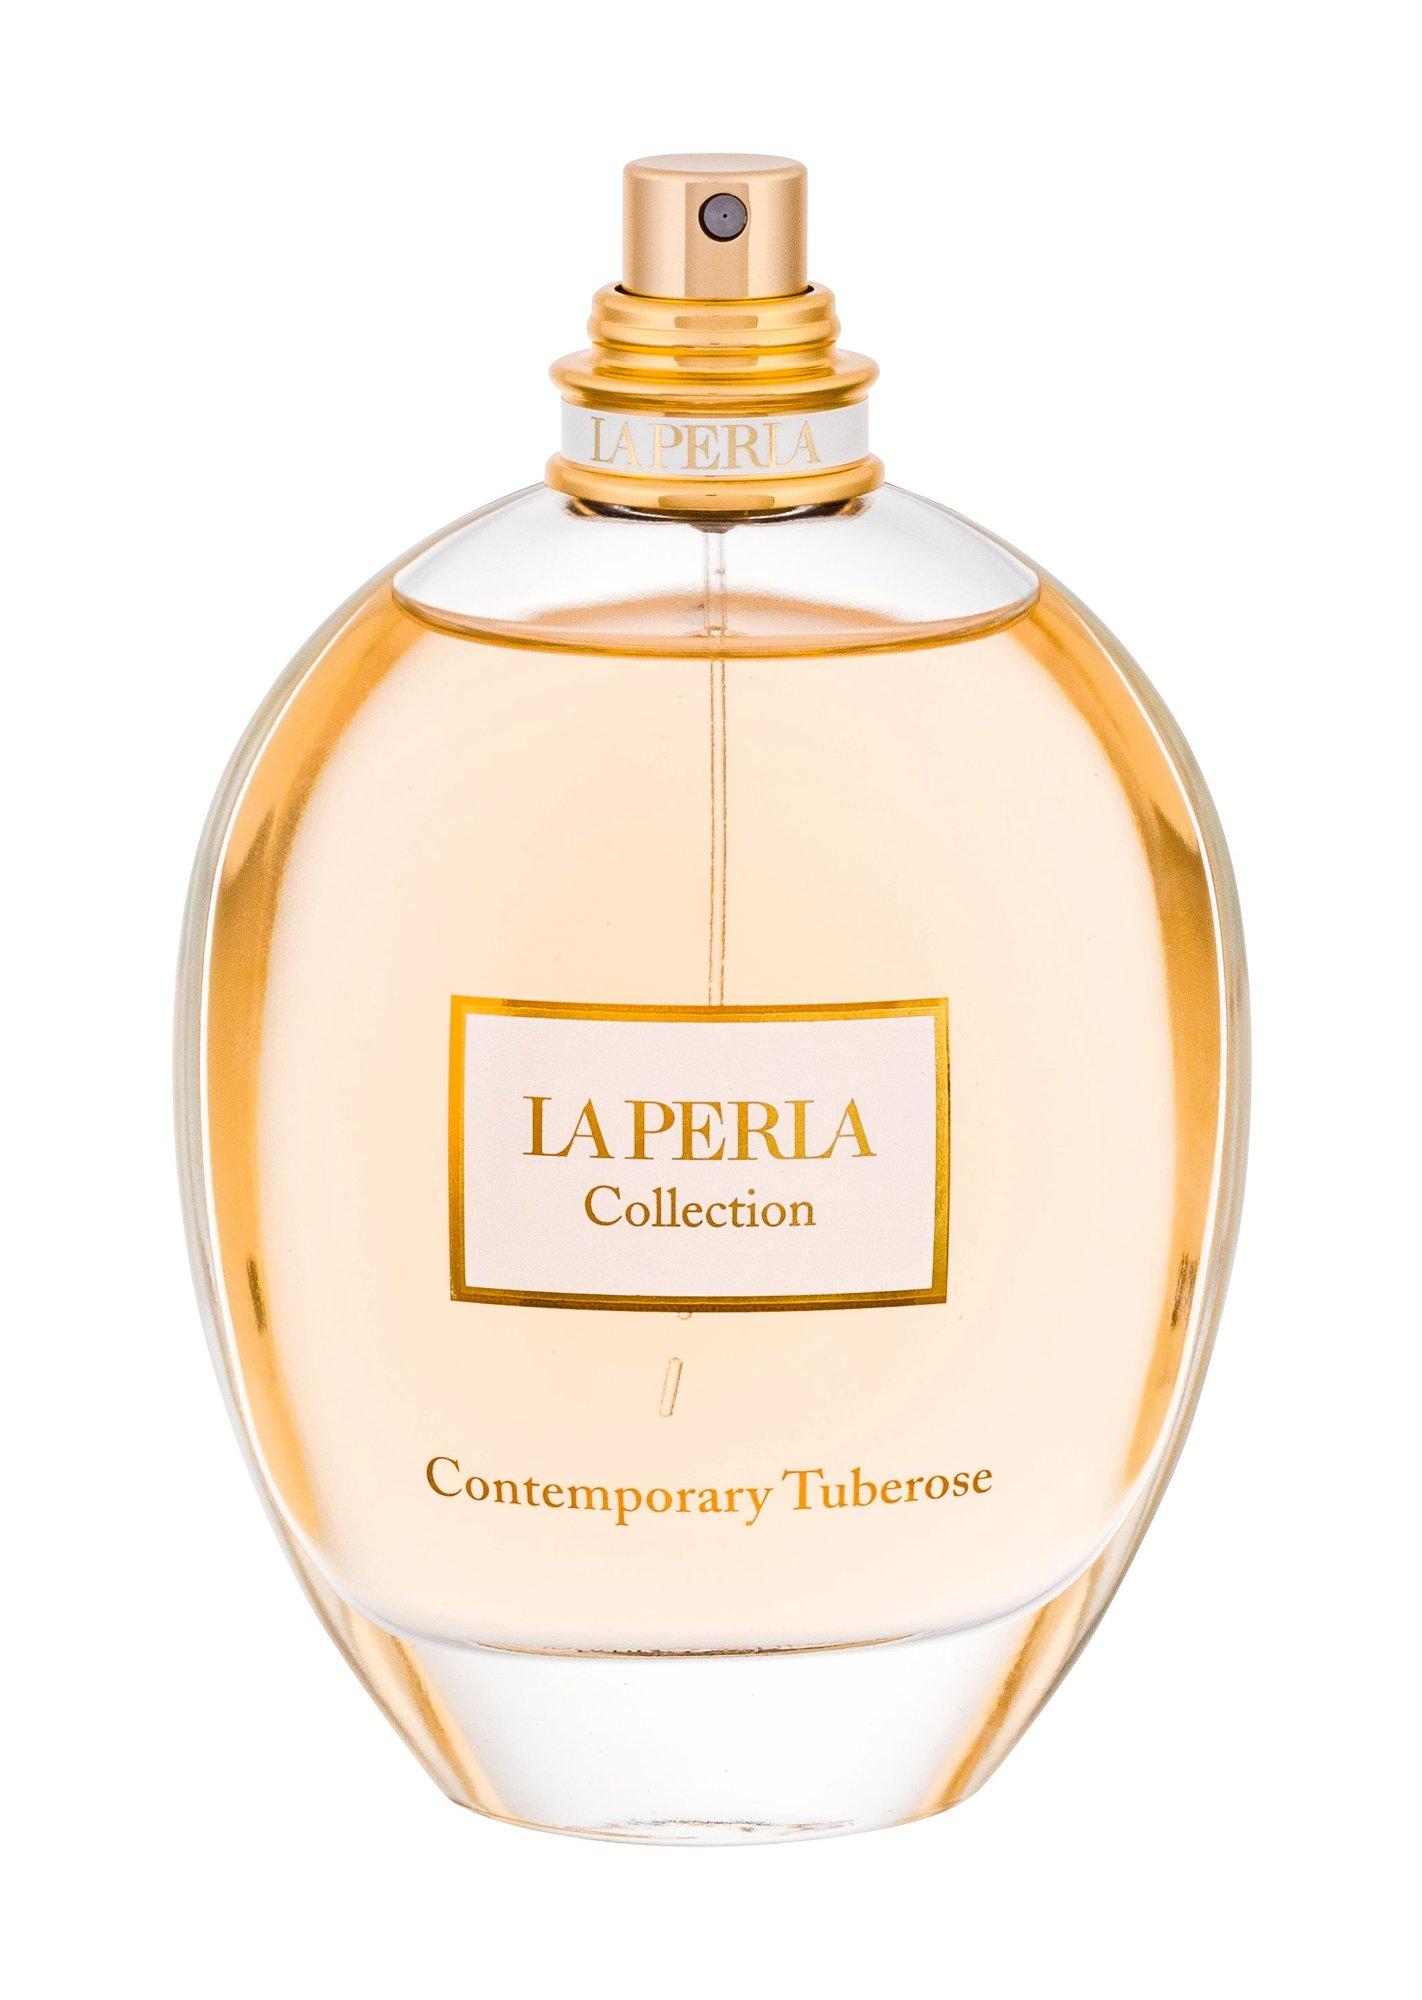 La Perla LA PERLA Collection Eau de Parfum 100ml  Contemporary Tuberose